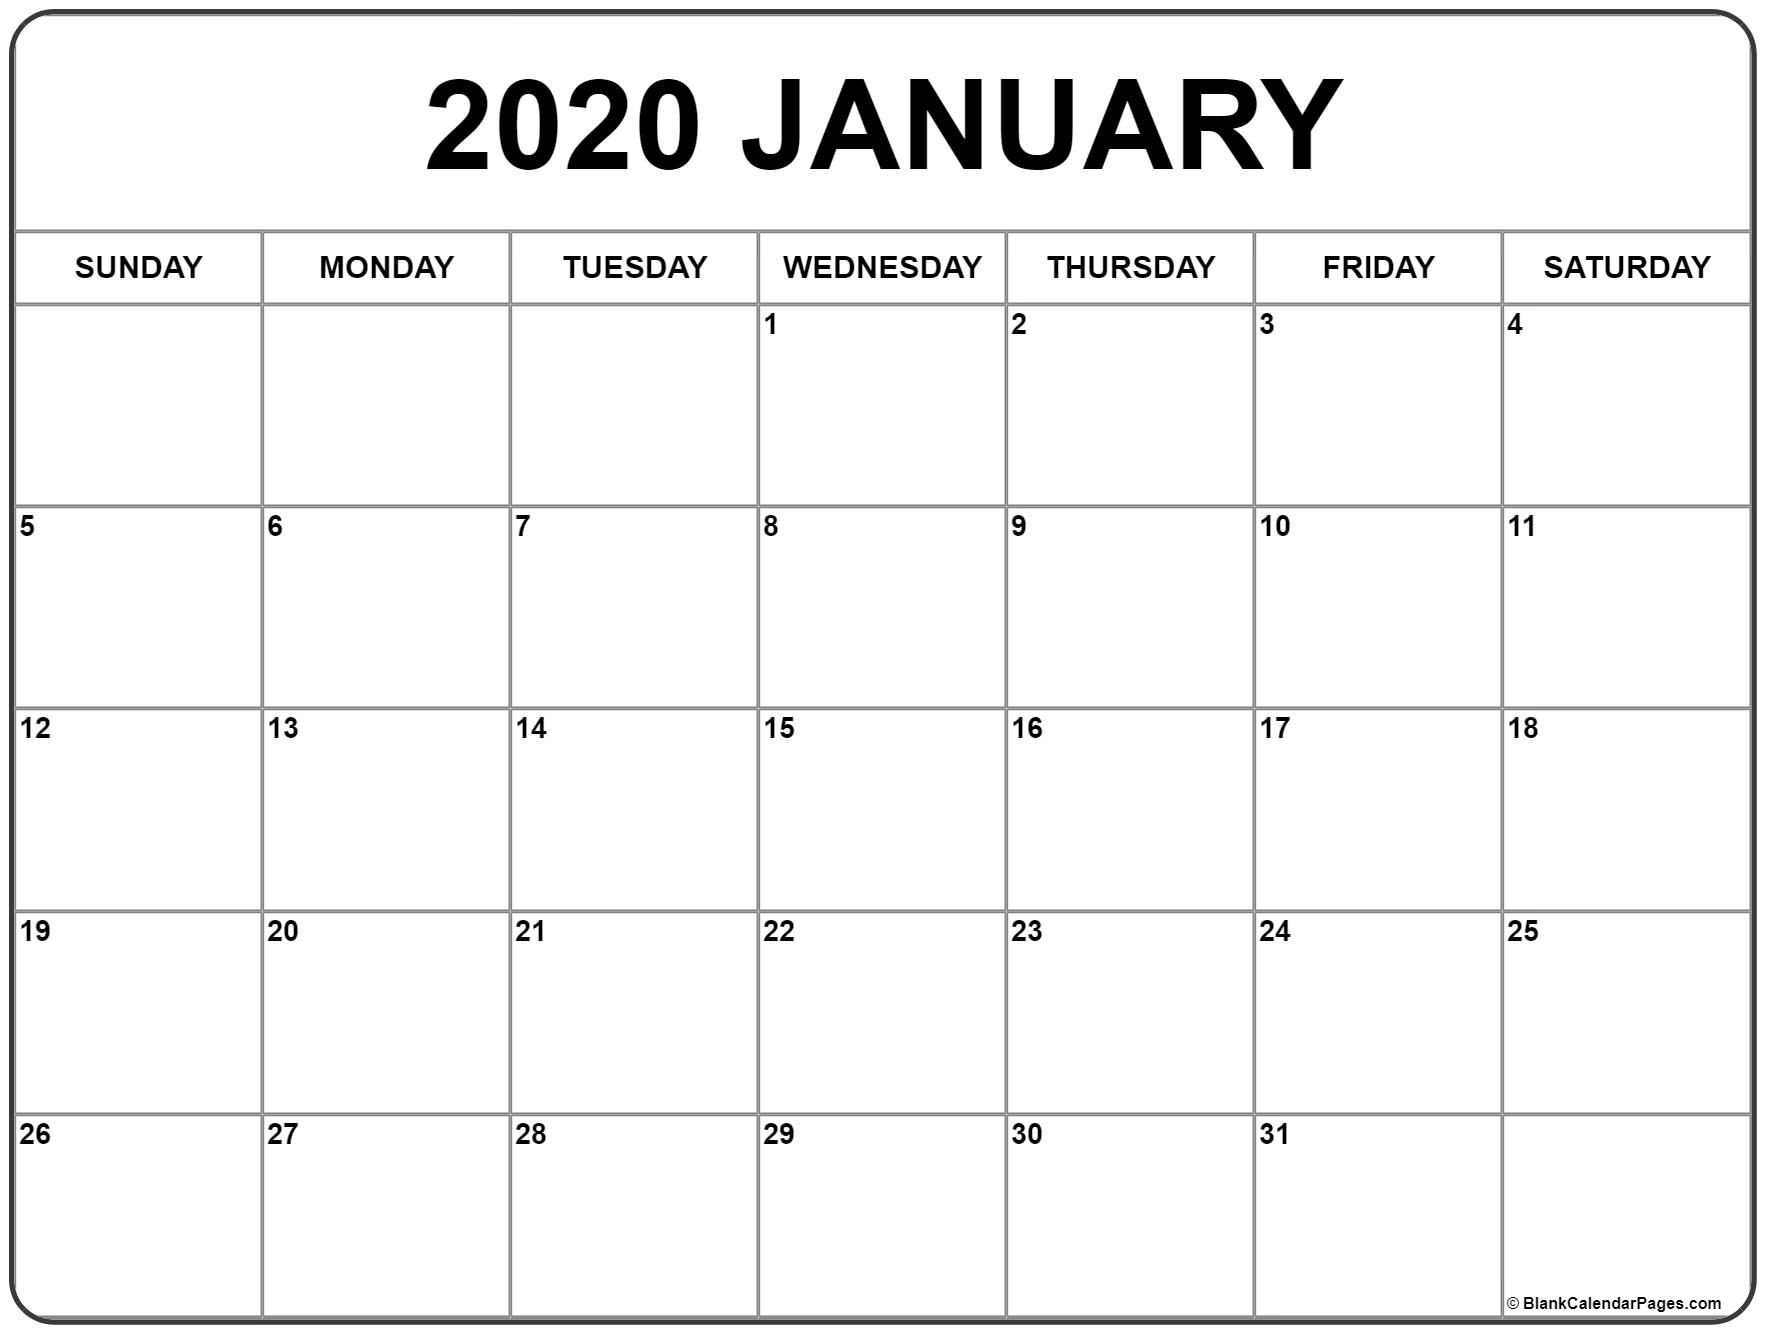 January 2020 Calendar | Free Printable Monthly Calendars-Blank Calandar Of Events 2020